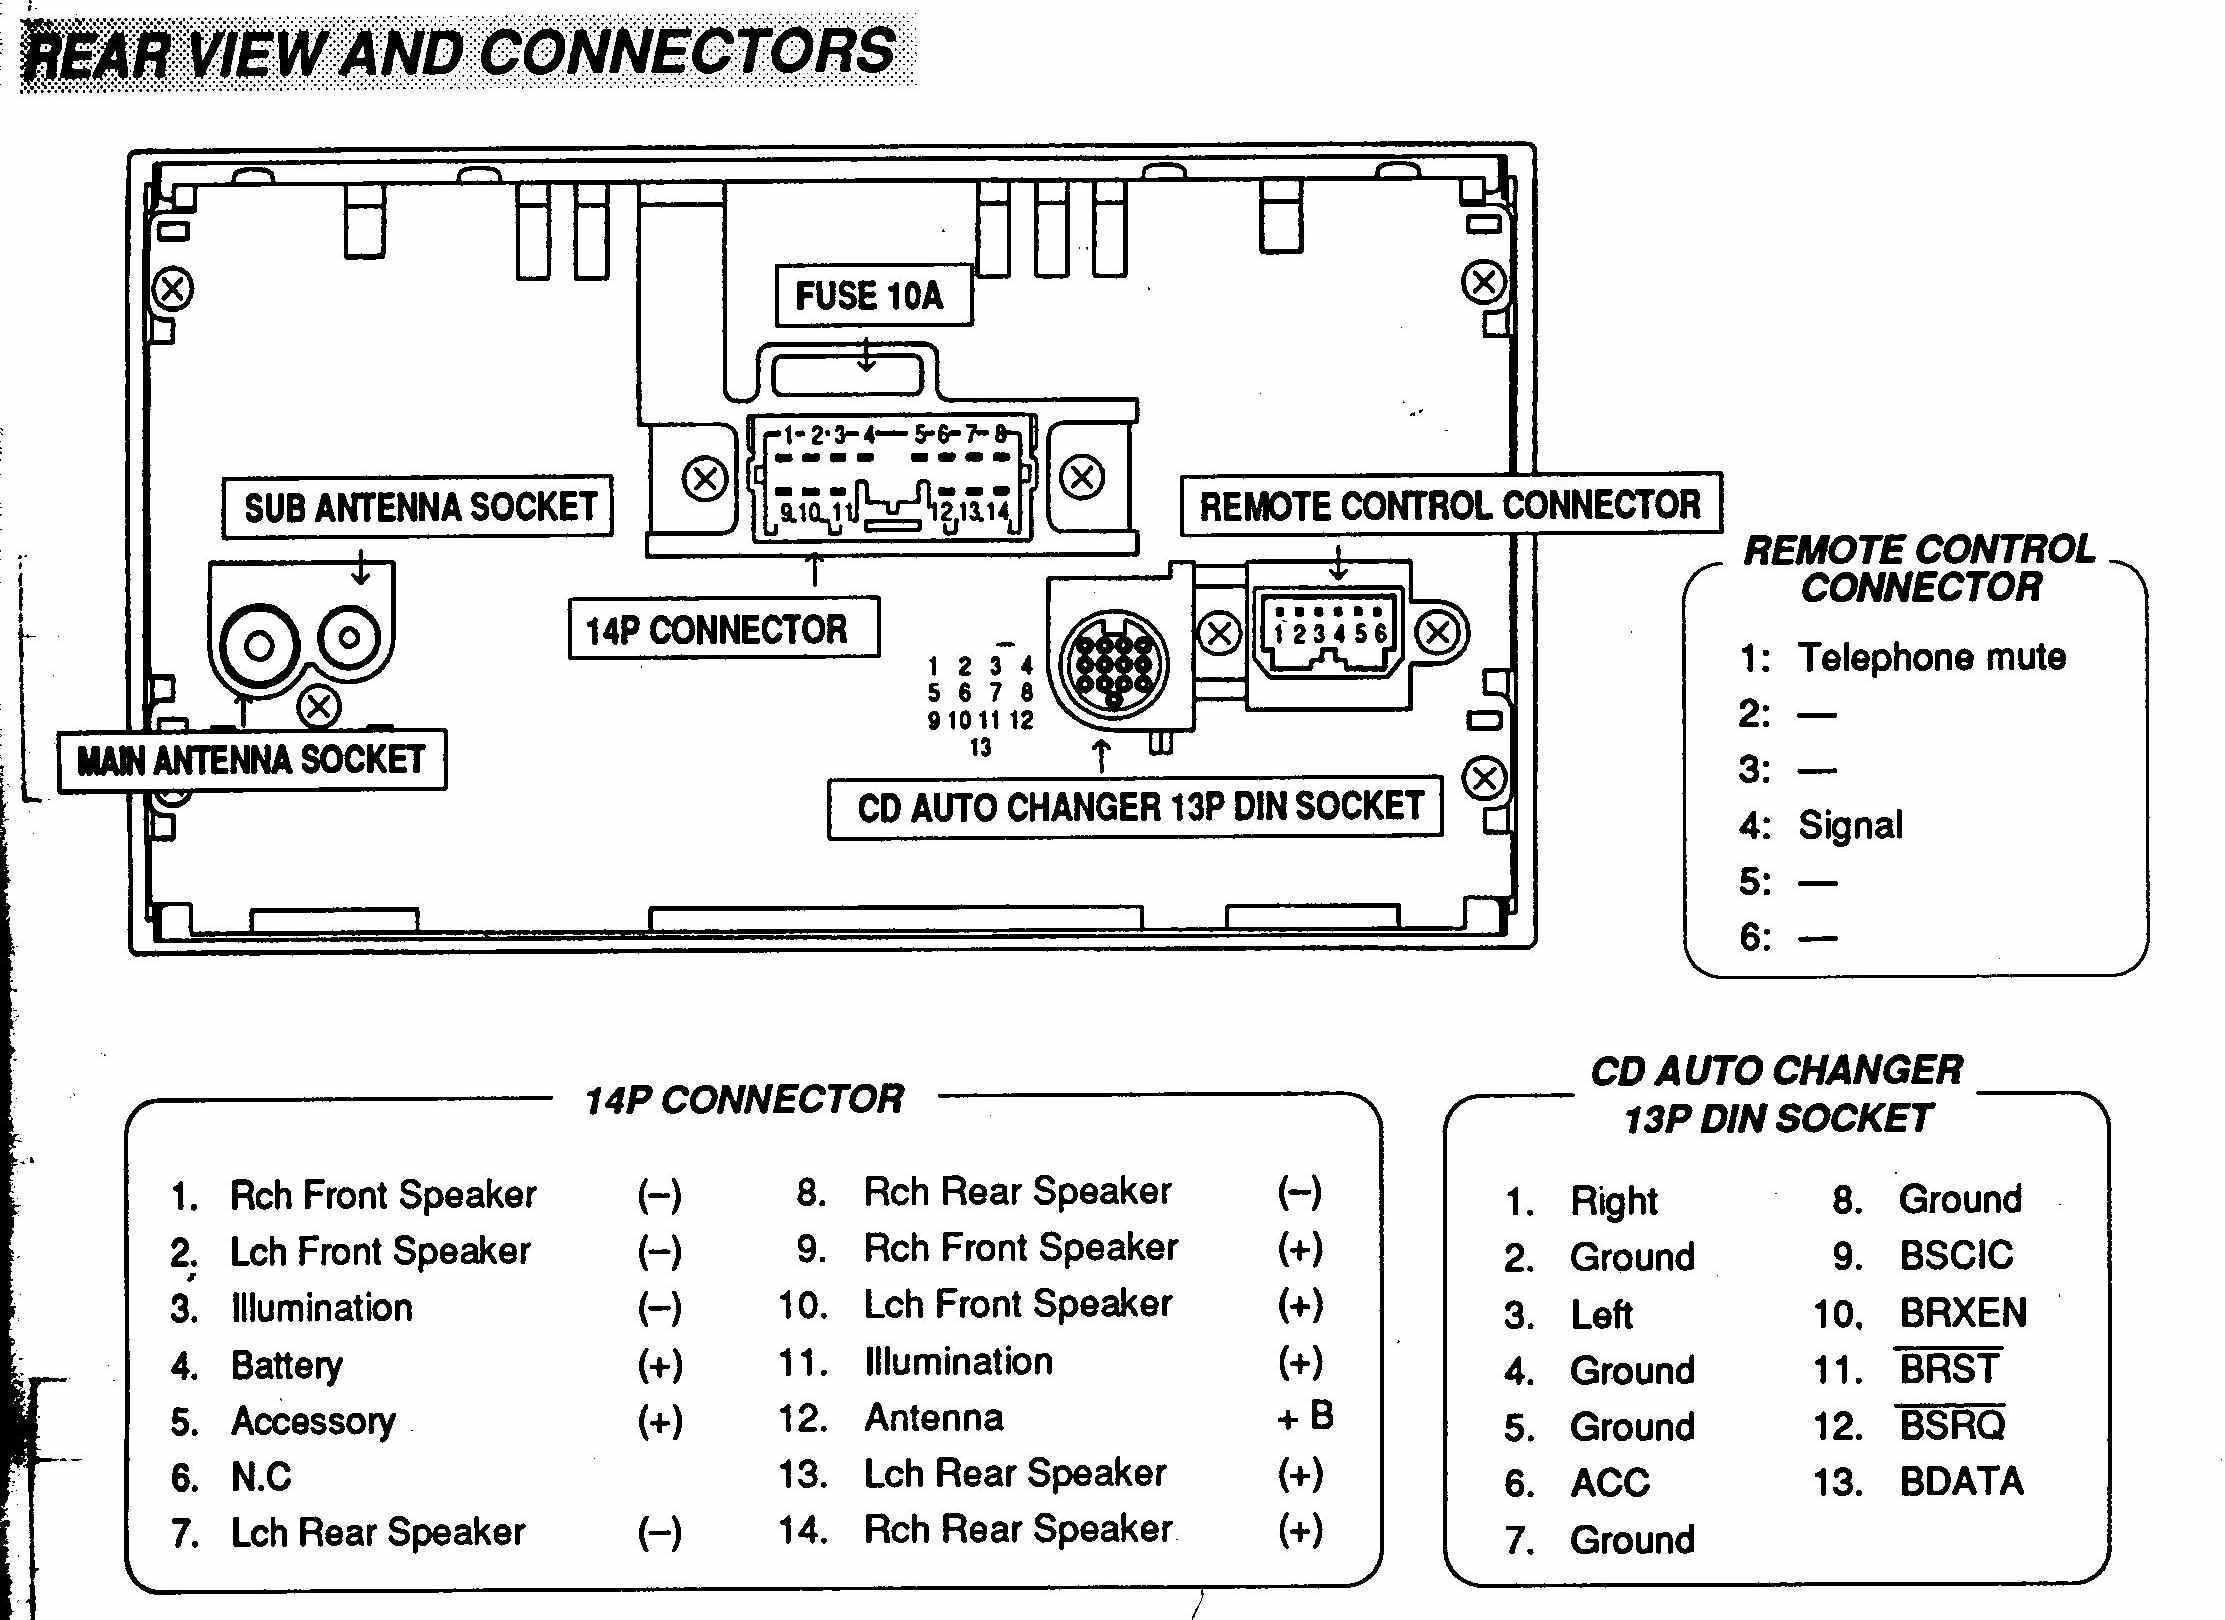 Sony Car Stereo Wiring Diagram Nakamichi Car Stereo Wiring Diagram Fresh sony Audio Beautiful Afif Of Sony Car Stereo Wiring Diagram